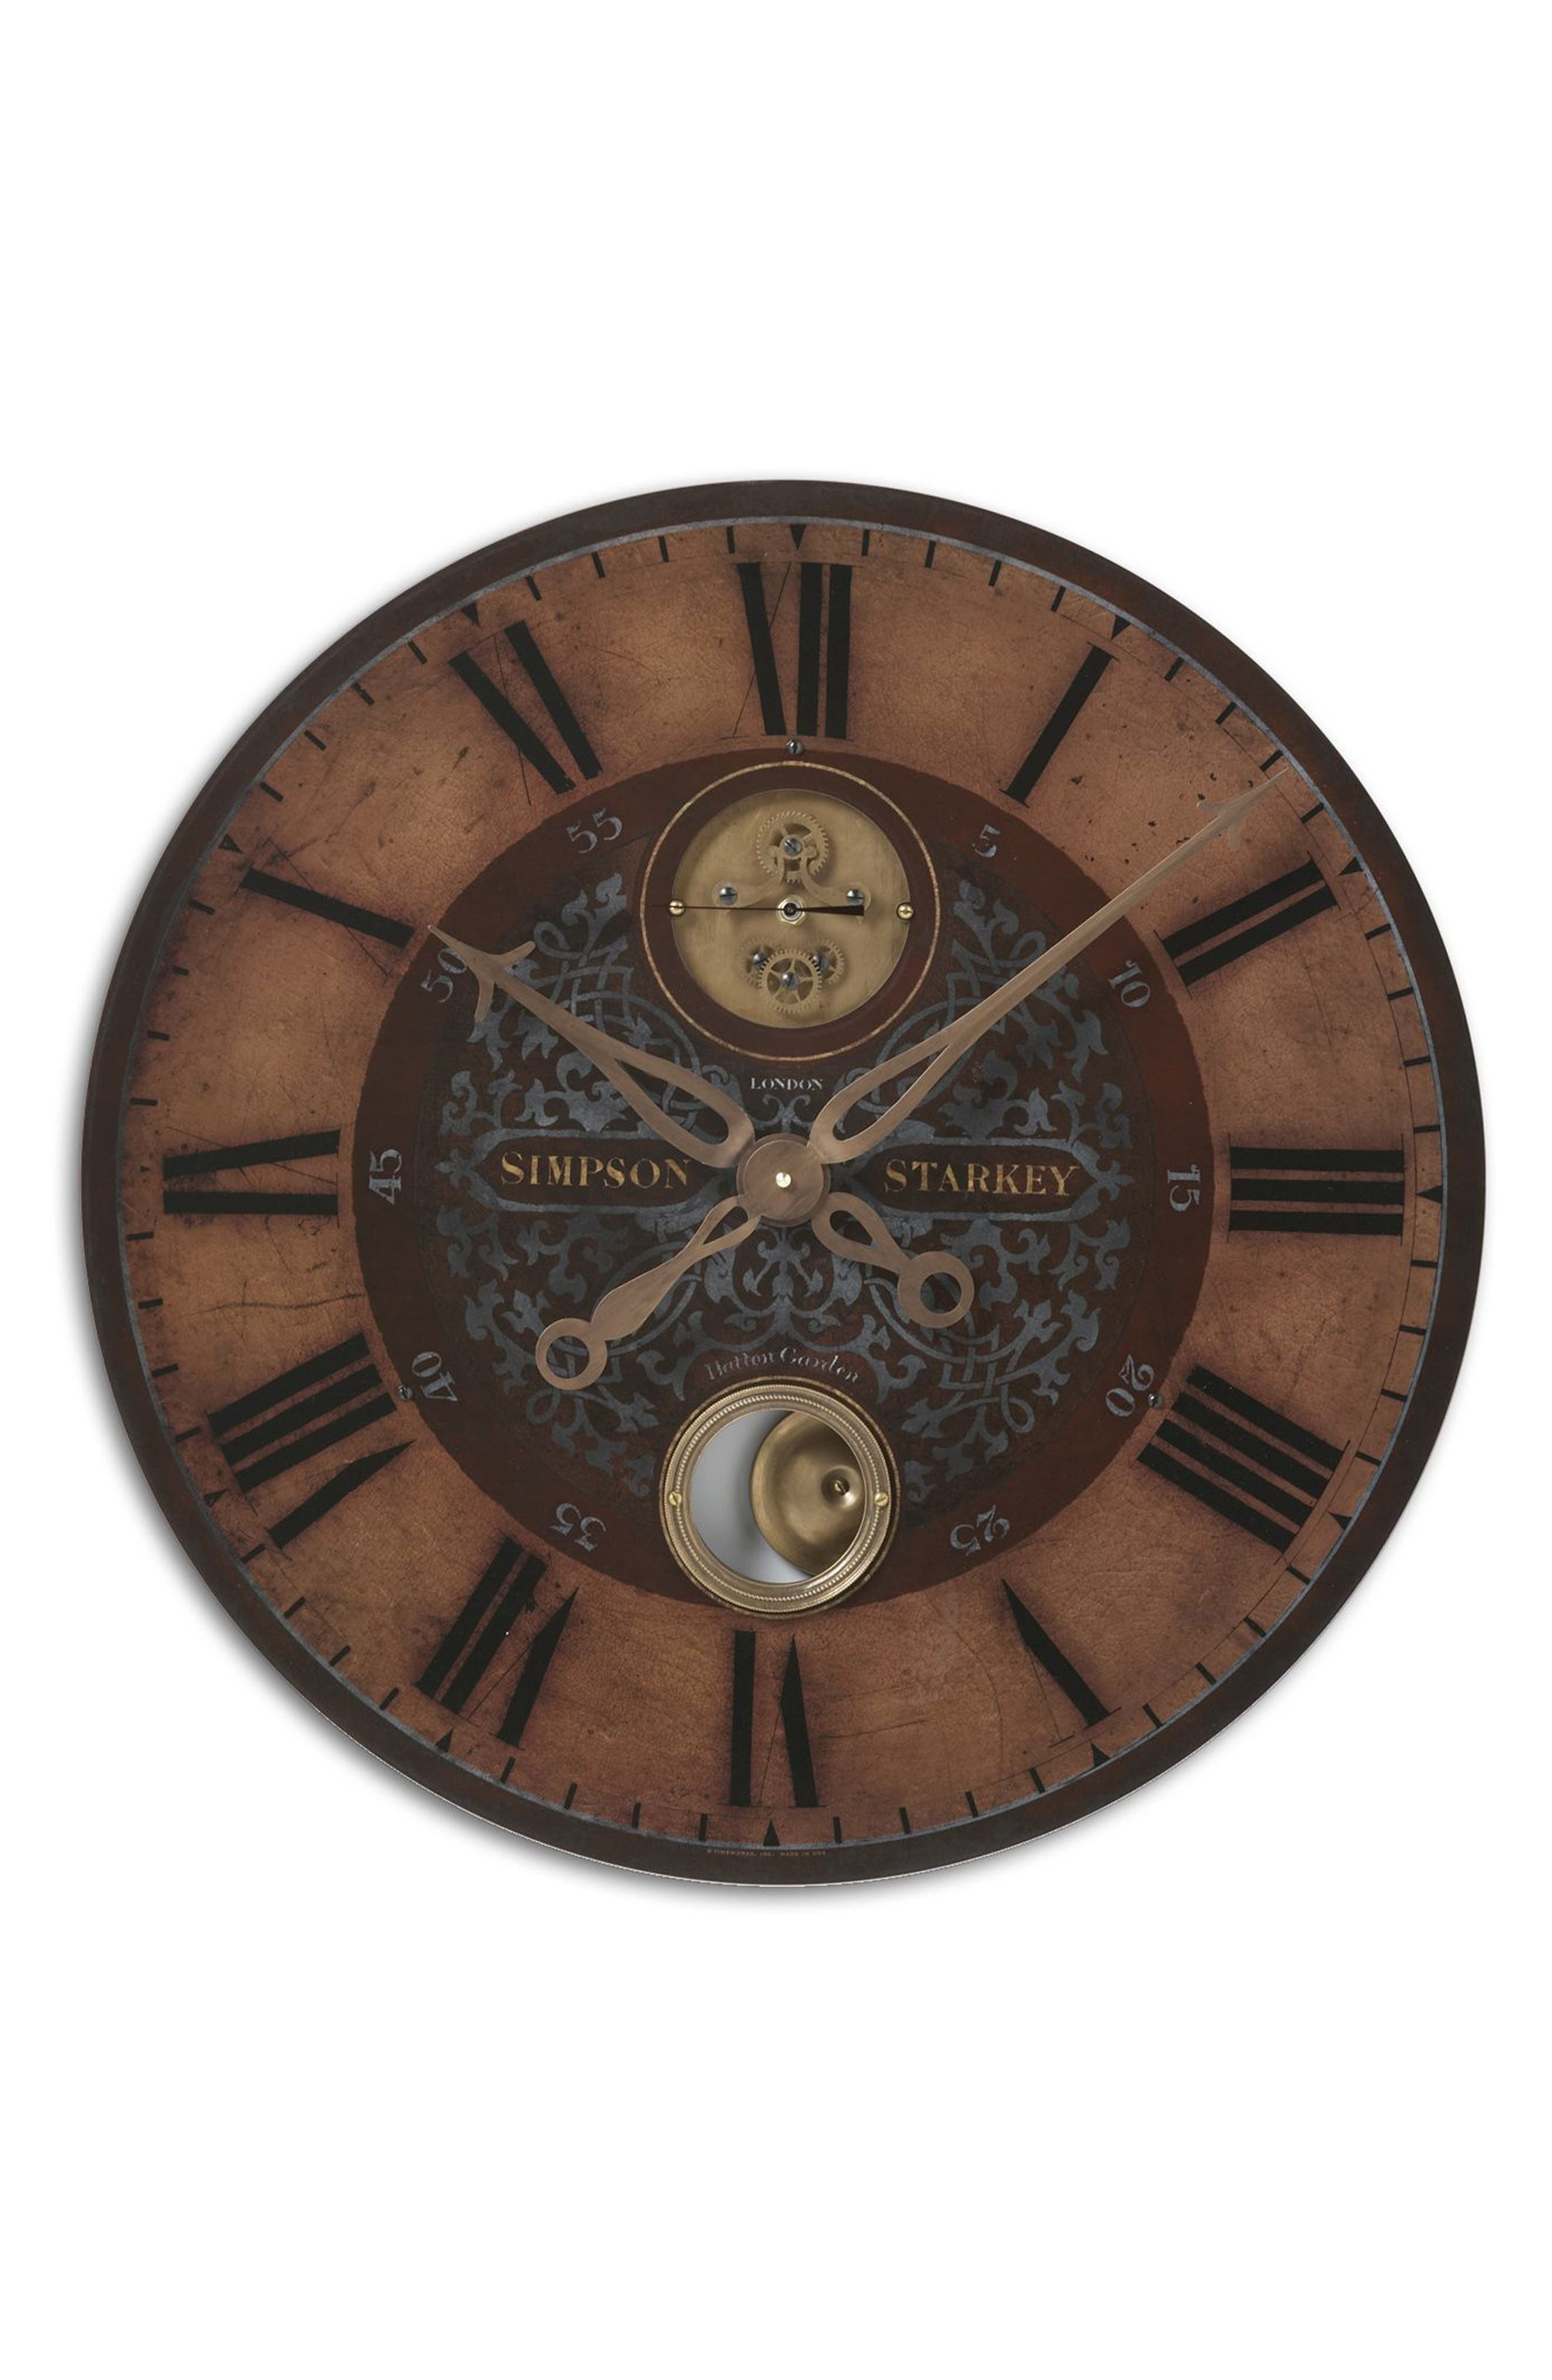 Simpson Starkey Wall Clock,                             Main thumbnail 1, color,                             220